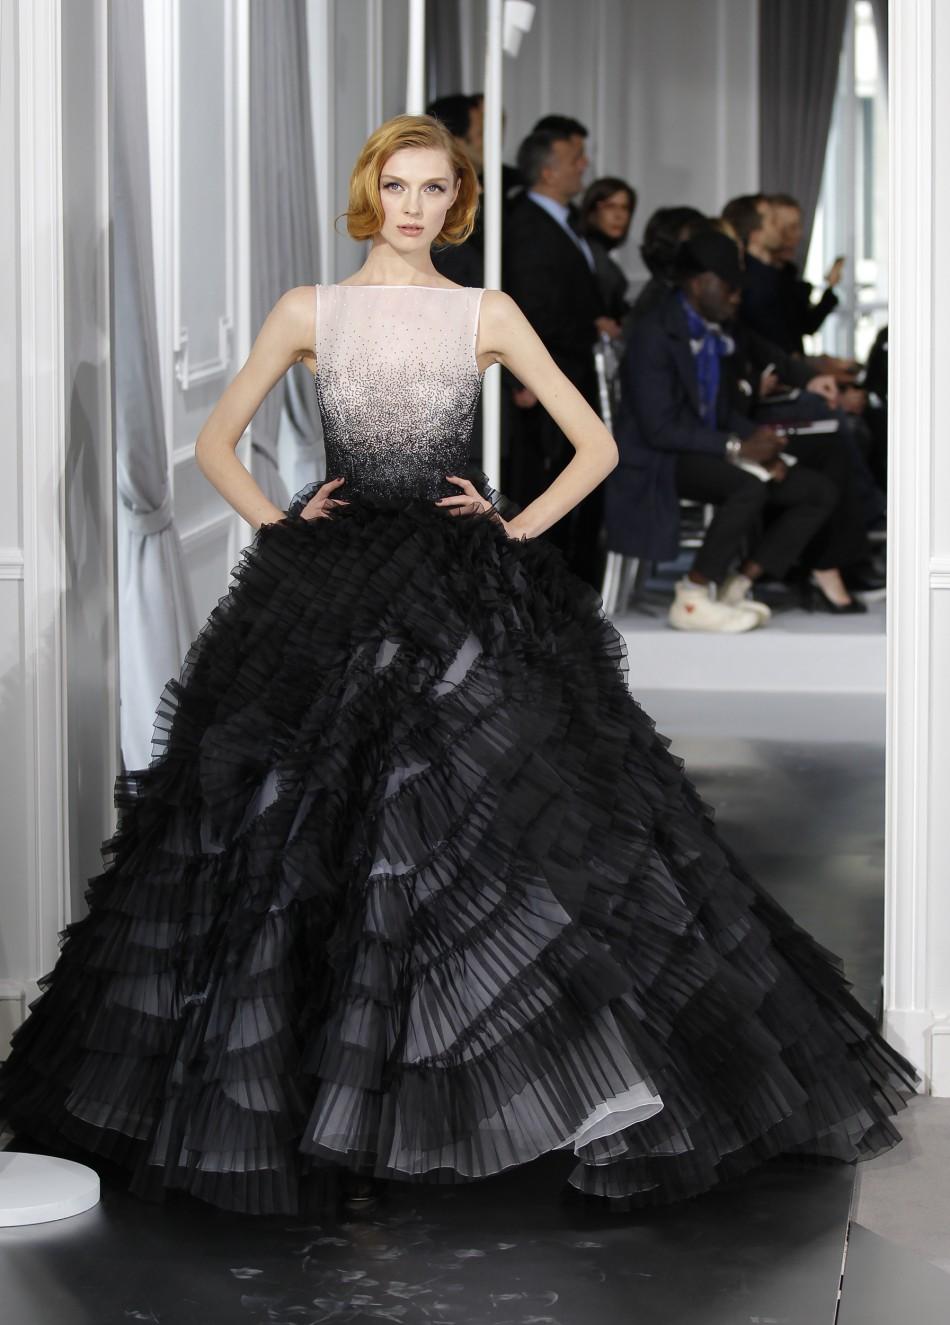 black-wedding-gowns-vera-wang-jaimee-rose-would-you-wear-a-black-wedding-dress-wallpaper-hd